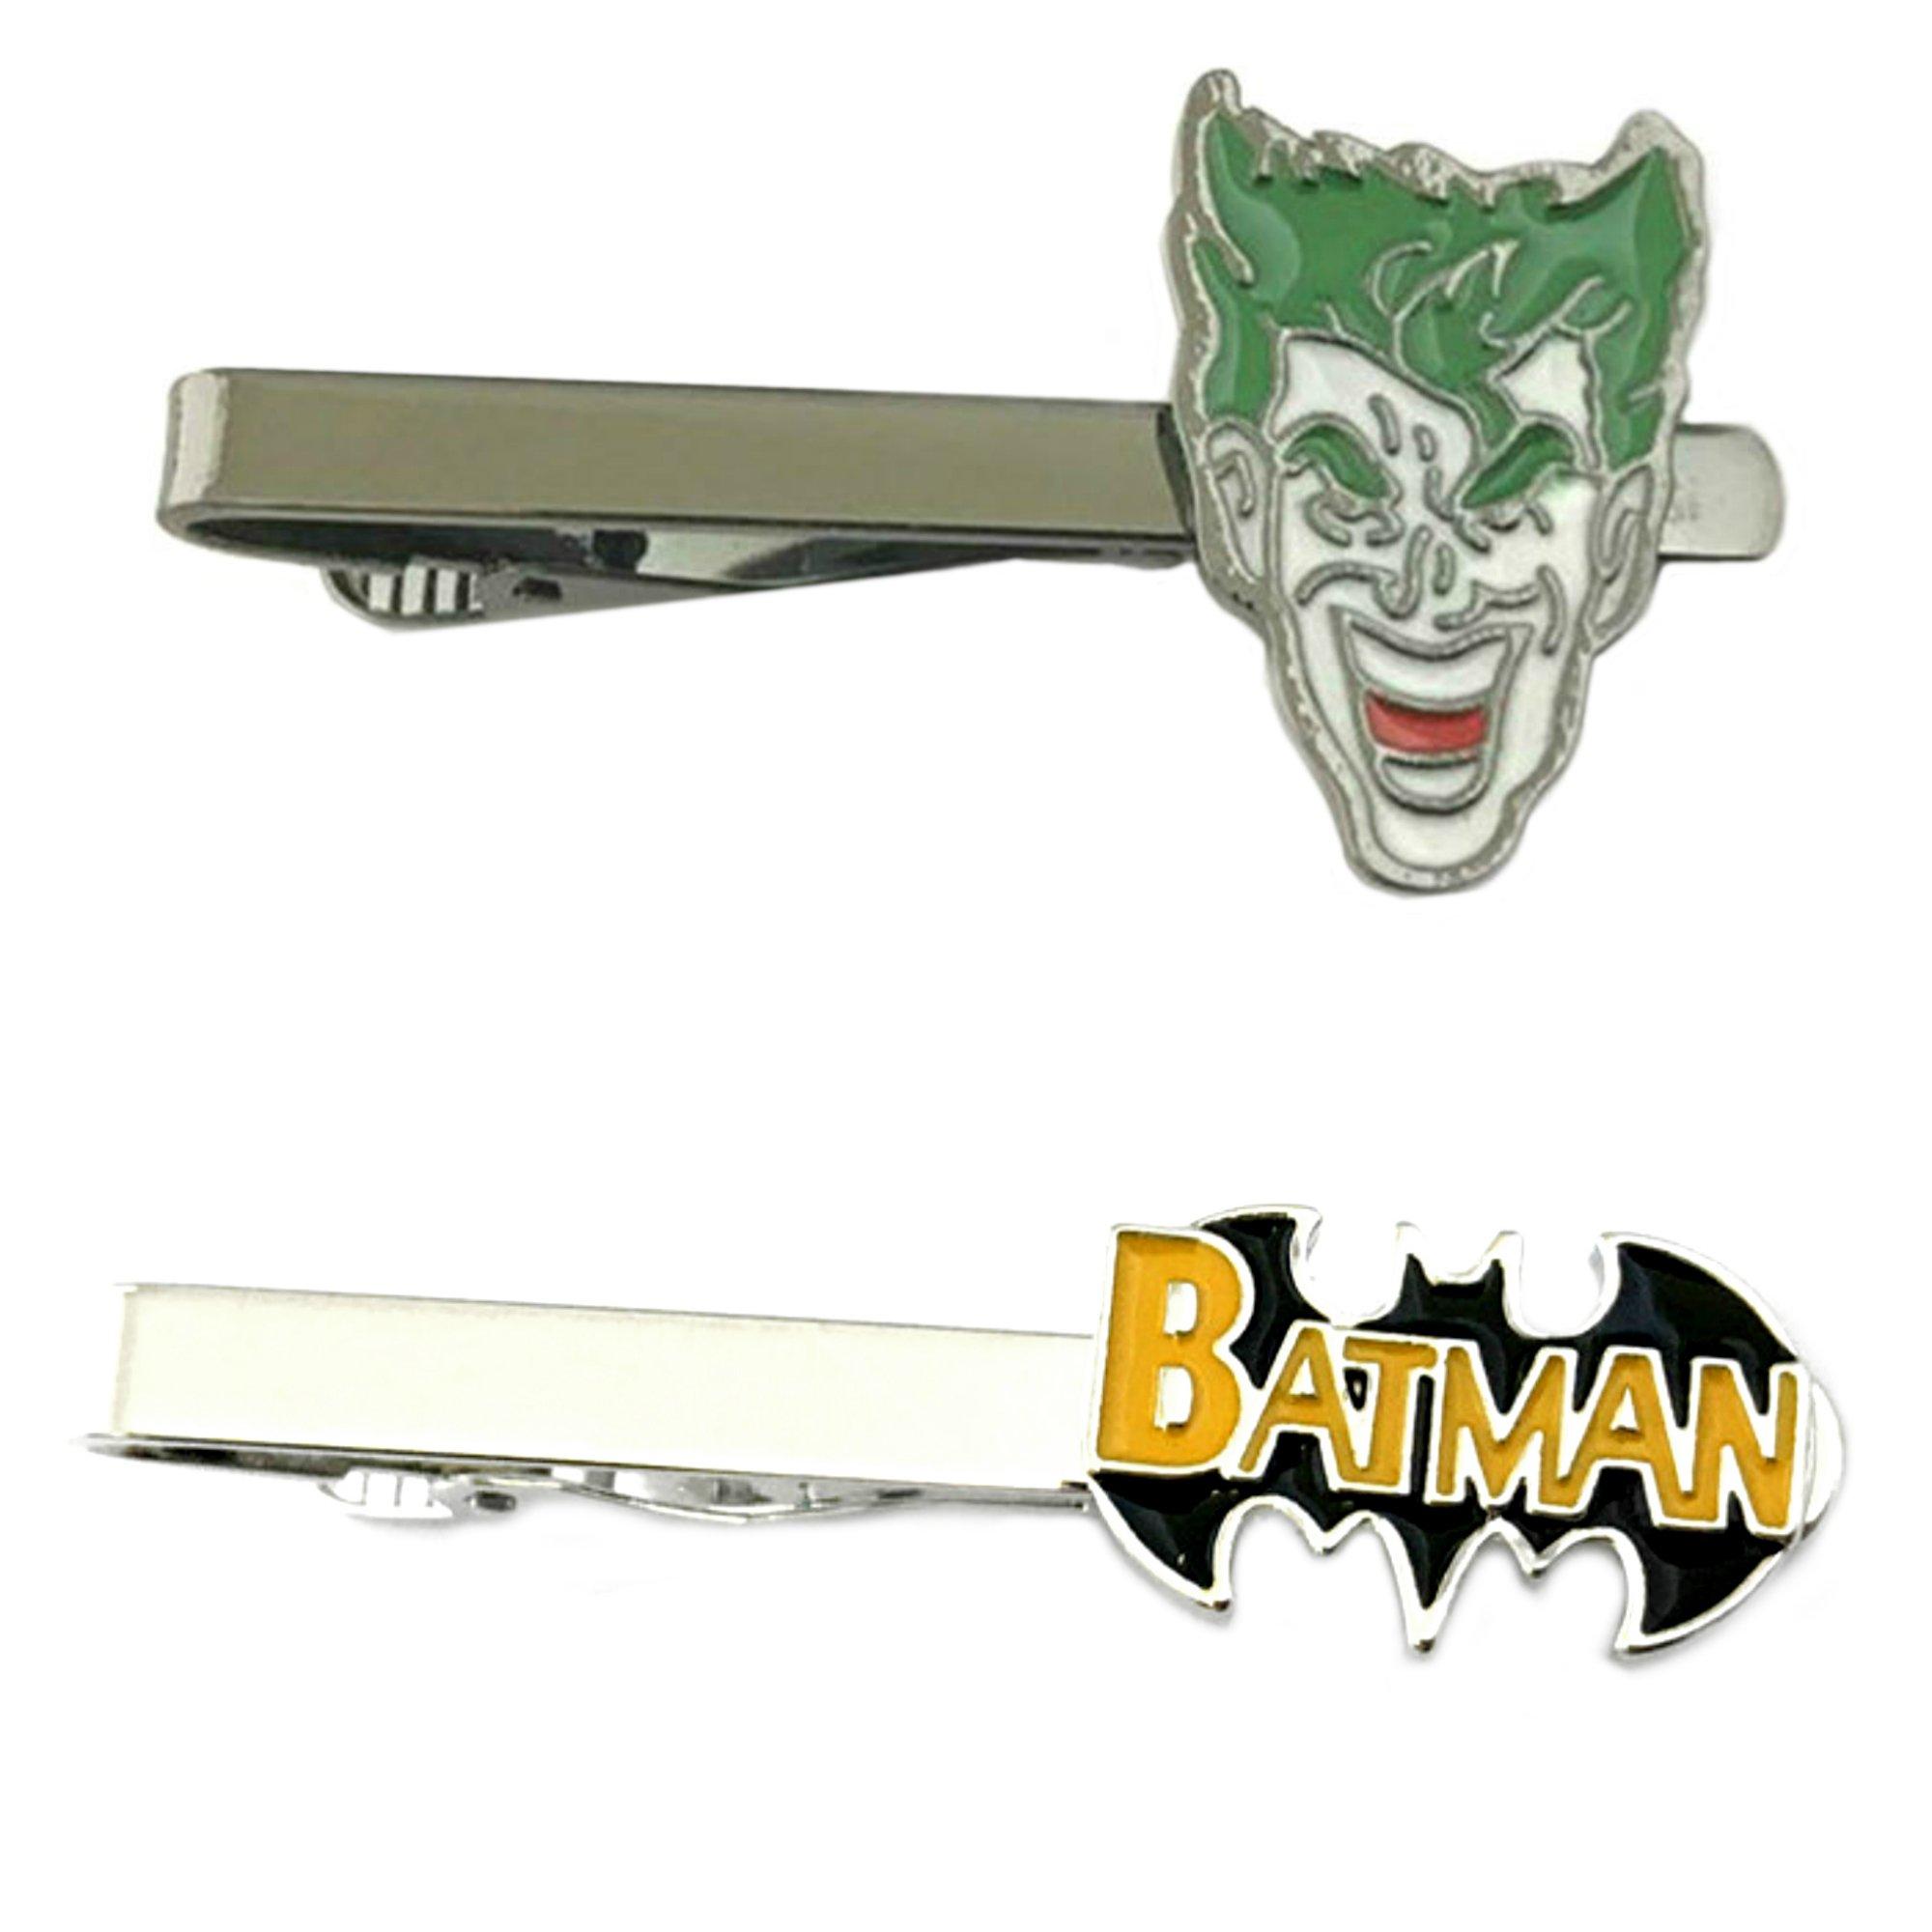 DC Comics - Joker & Batman Text Logo - Tiebar Tie Clasp Set of 2 Wedding Superhero Logo w/Gift Box